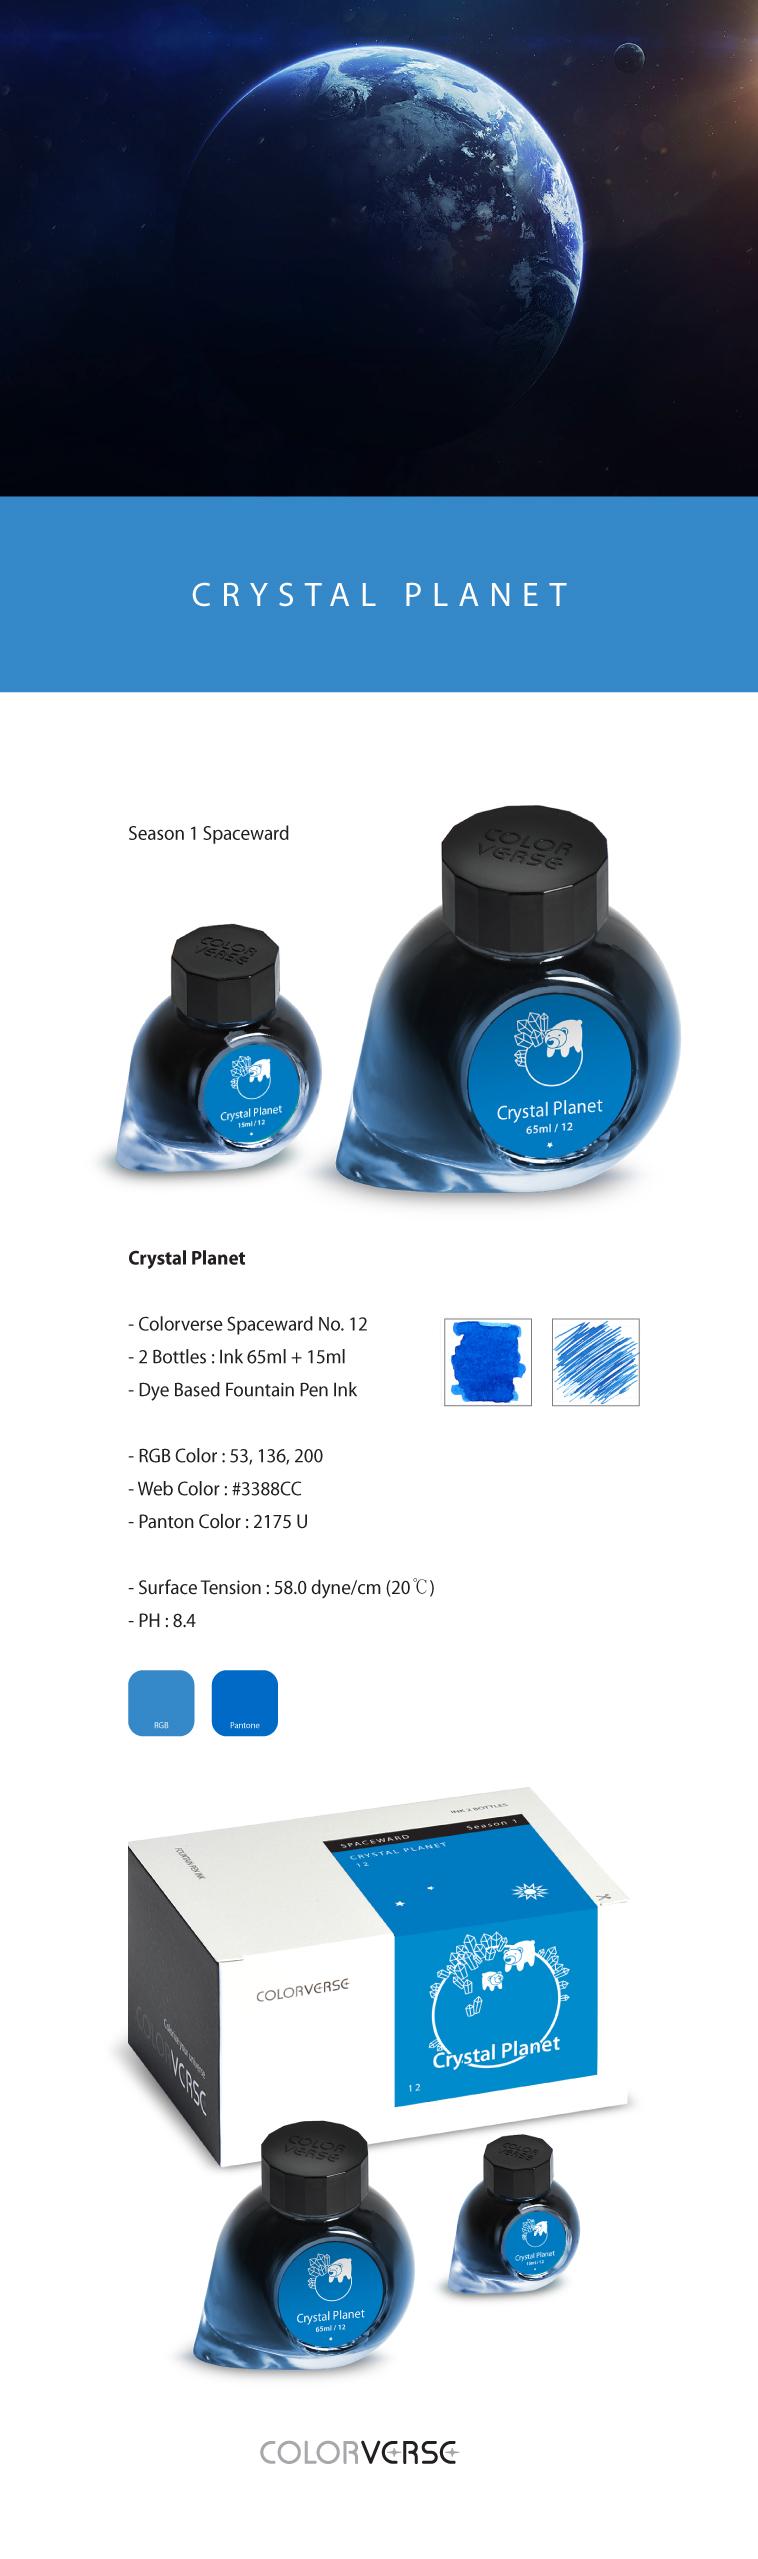 12Crystal Planet水晶星球   賈絲筆咧 Juspirit